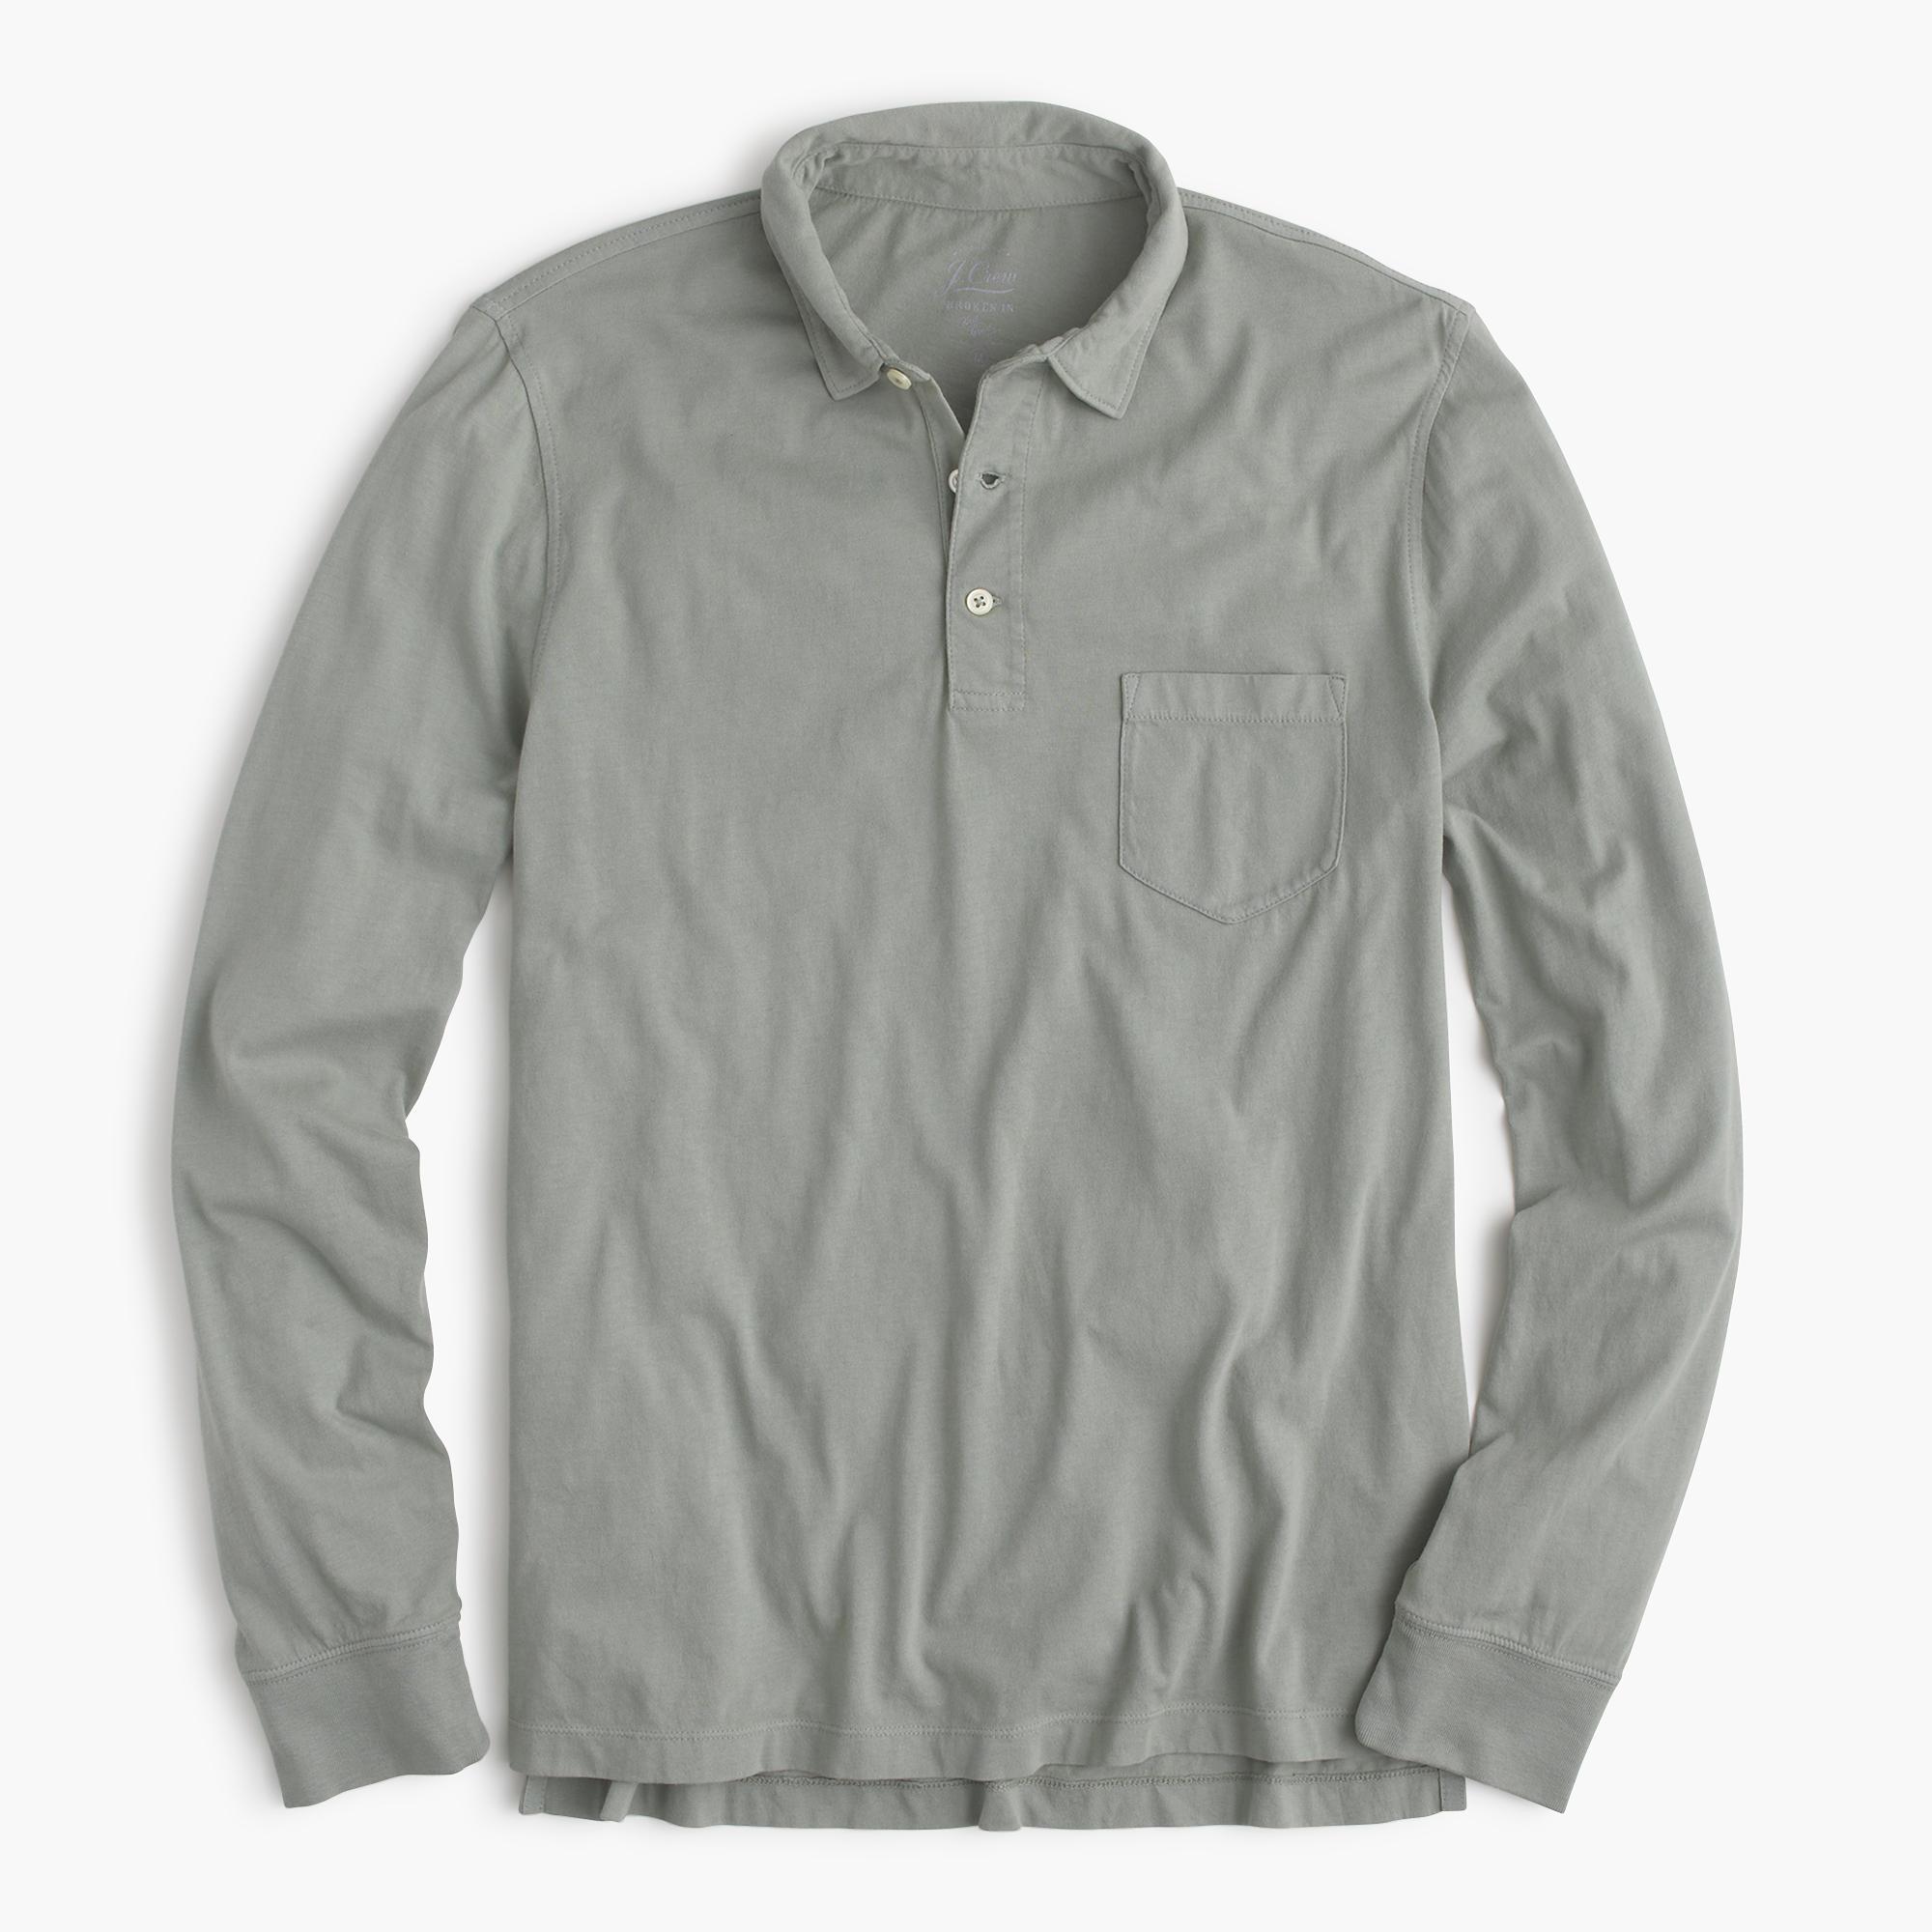 Jersey + Collar